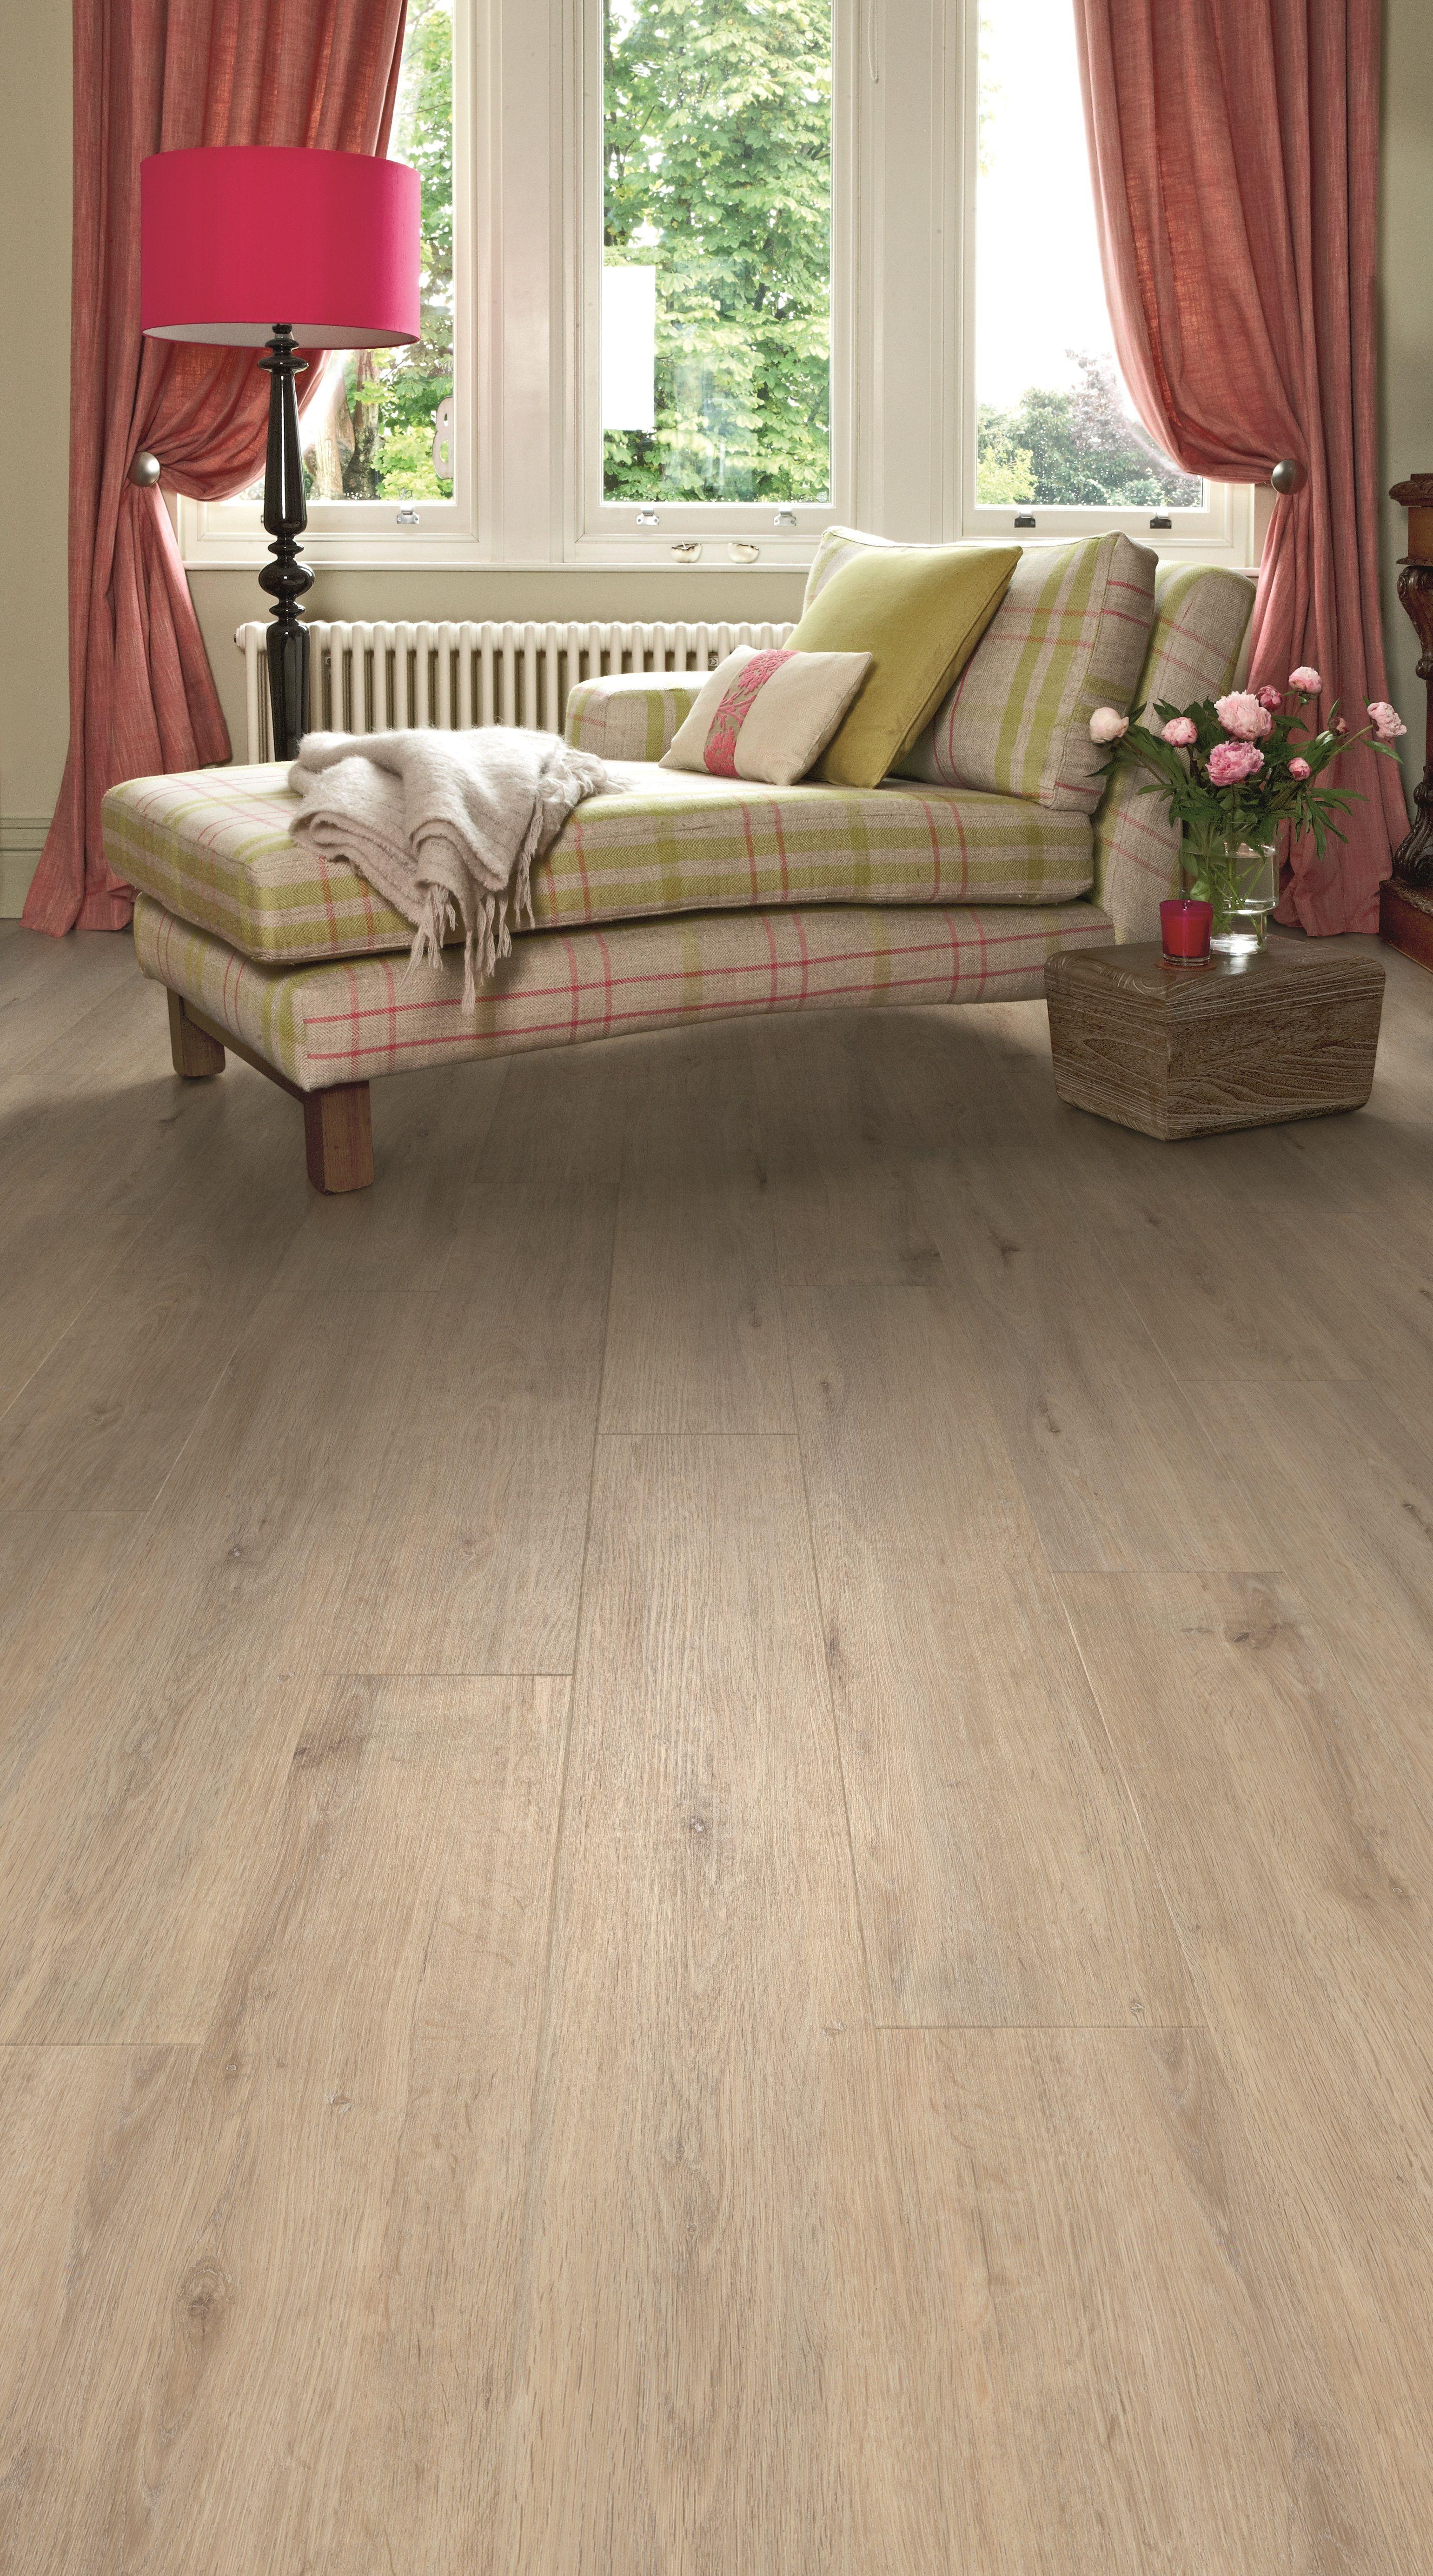 Fusion Flooring 1061 Country Elm Beautiful Living E Luxury Vinyl Plank Tile